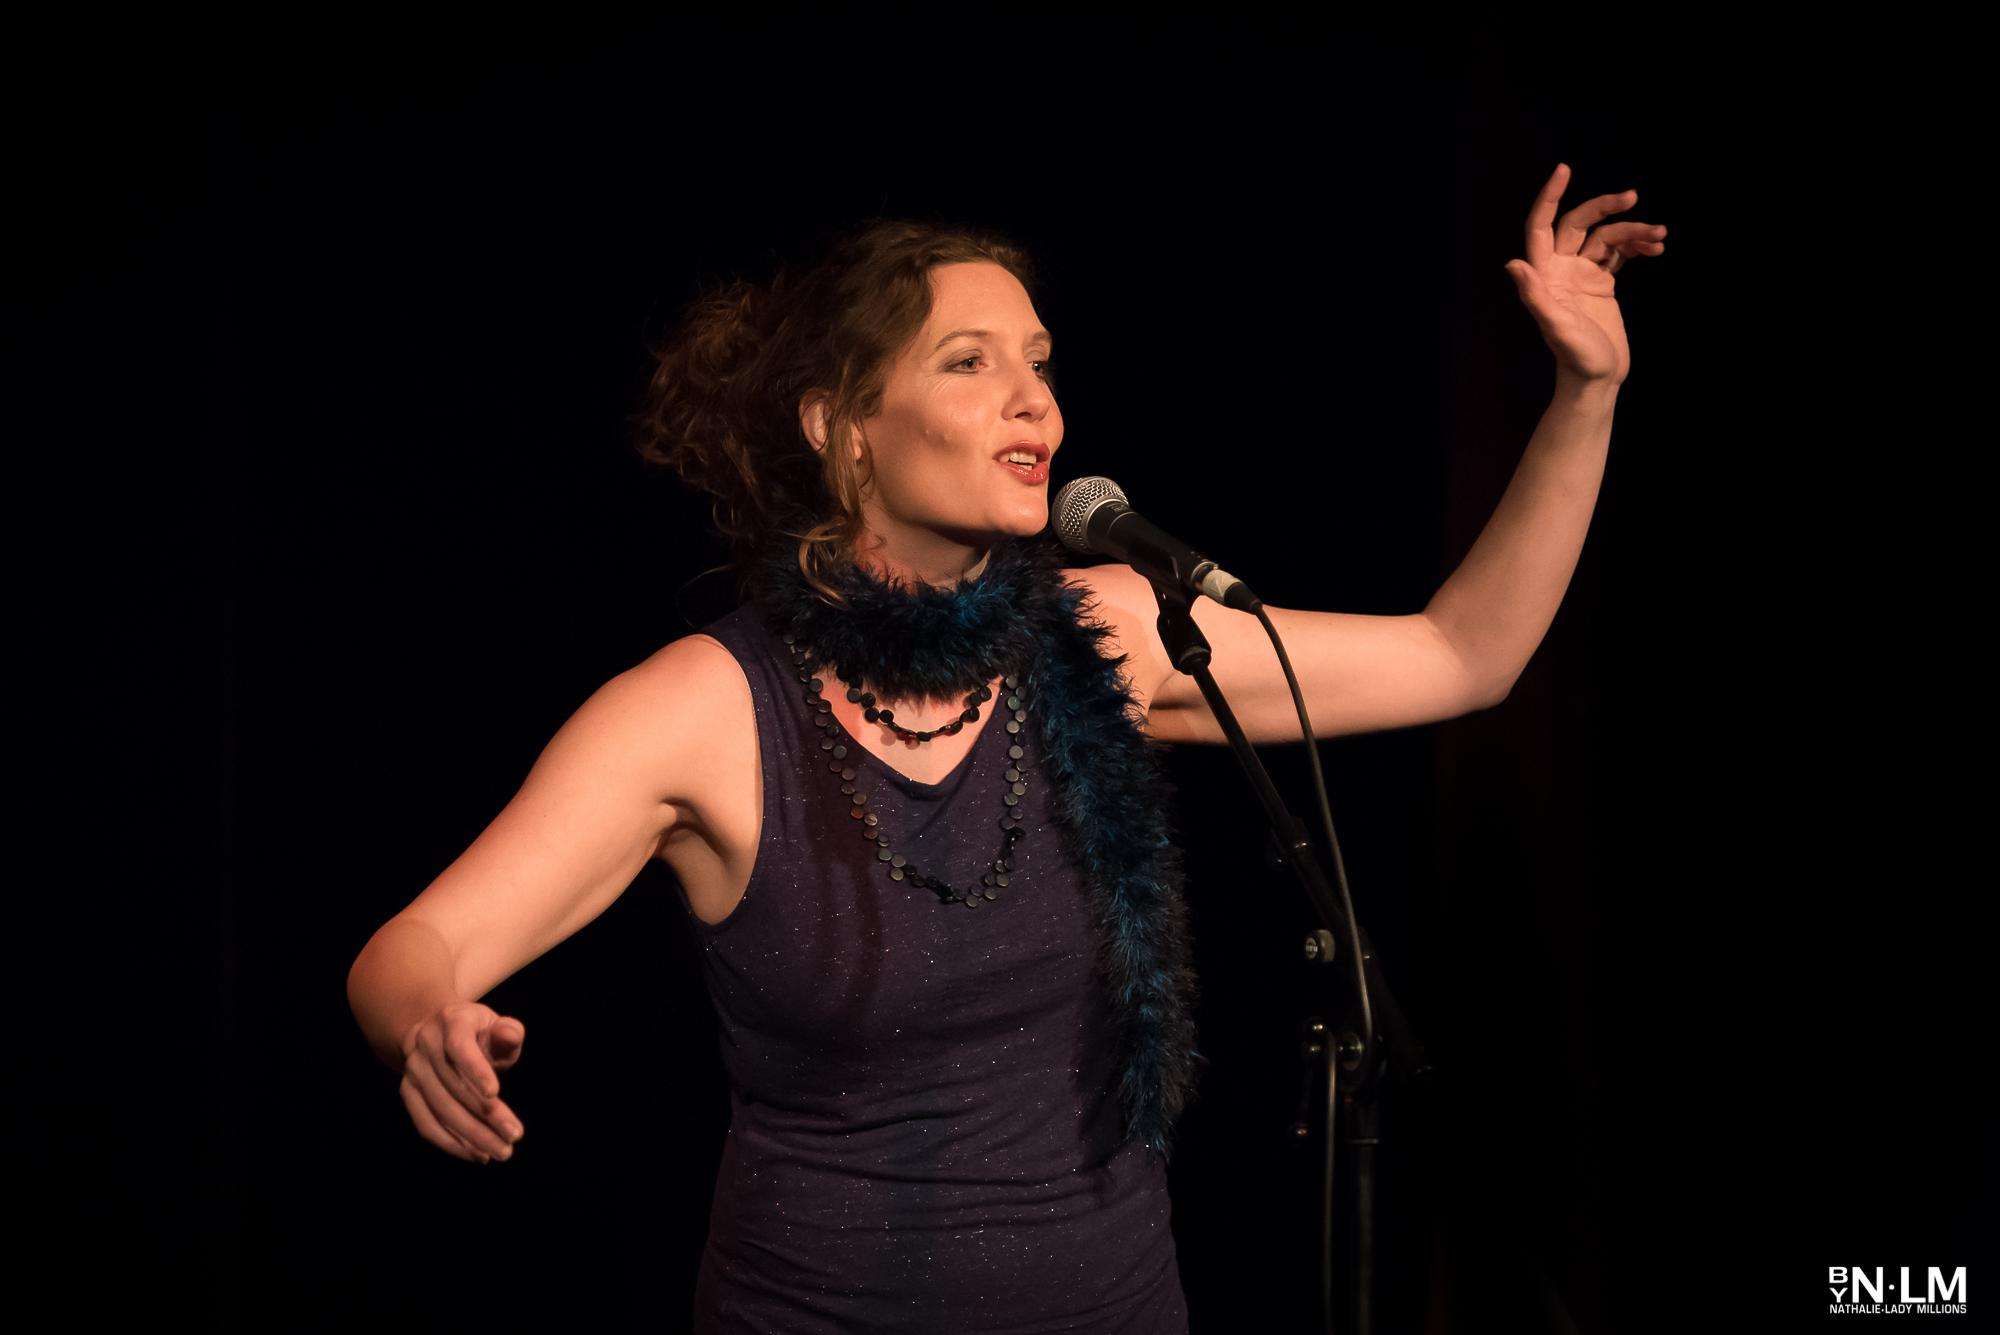 Juliette Kapla